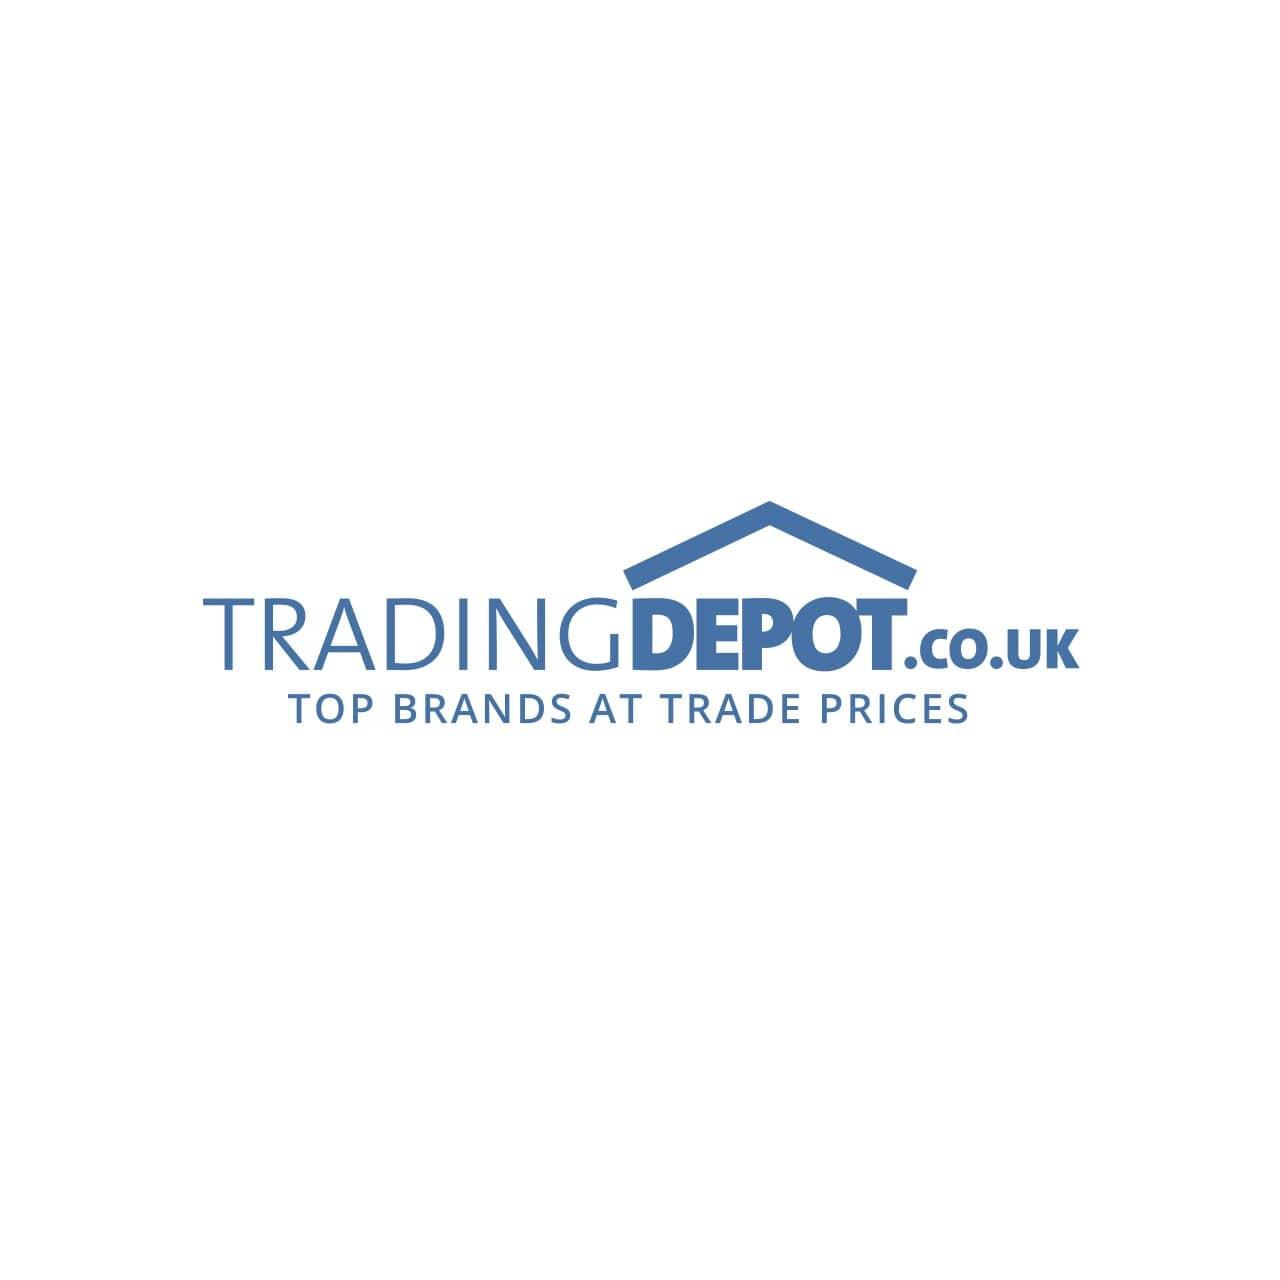 Velux Centre-Pivot Roof Window - Triple Glazed with Anti-Dew & Easy Clean Glazing – White Polyurethane 134 x 140cm - GGU UK08 0066